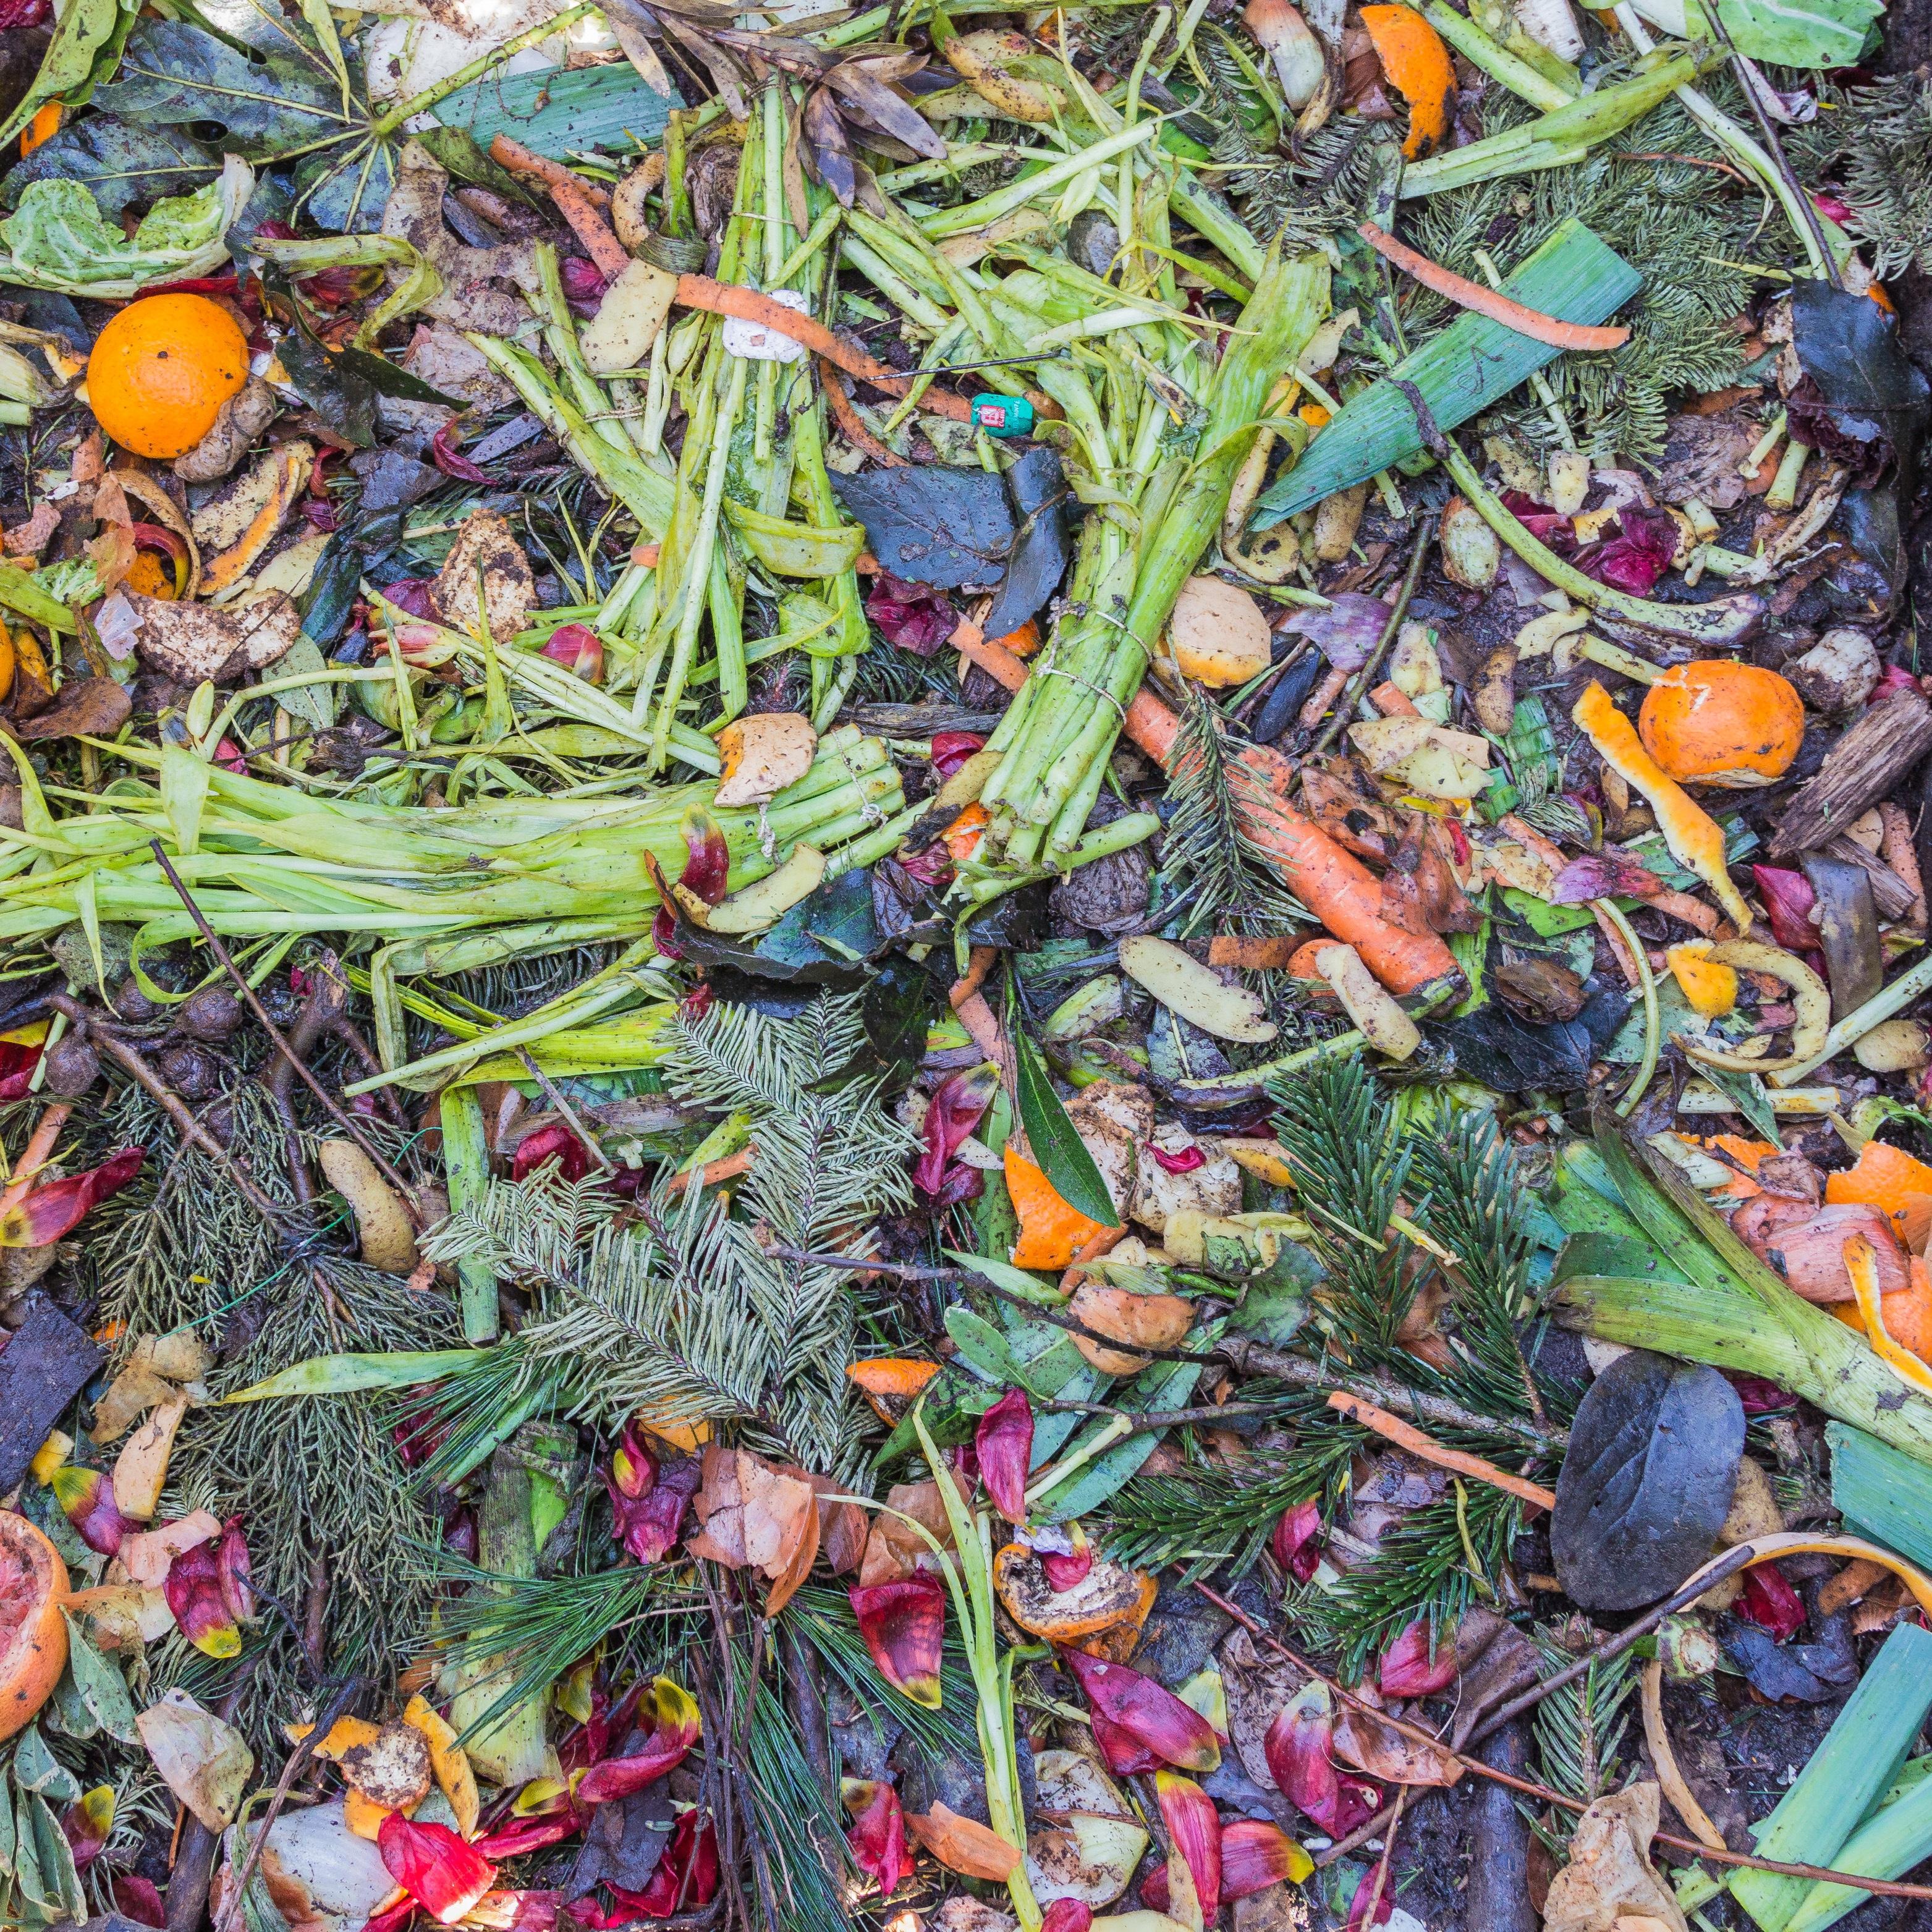 Free Images : leaf, flower, pattern, food, herb, produce ...